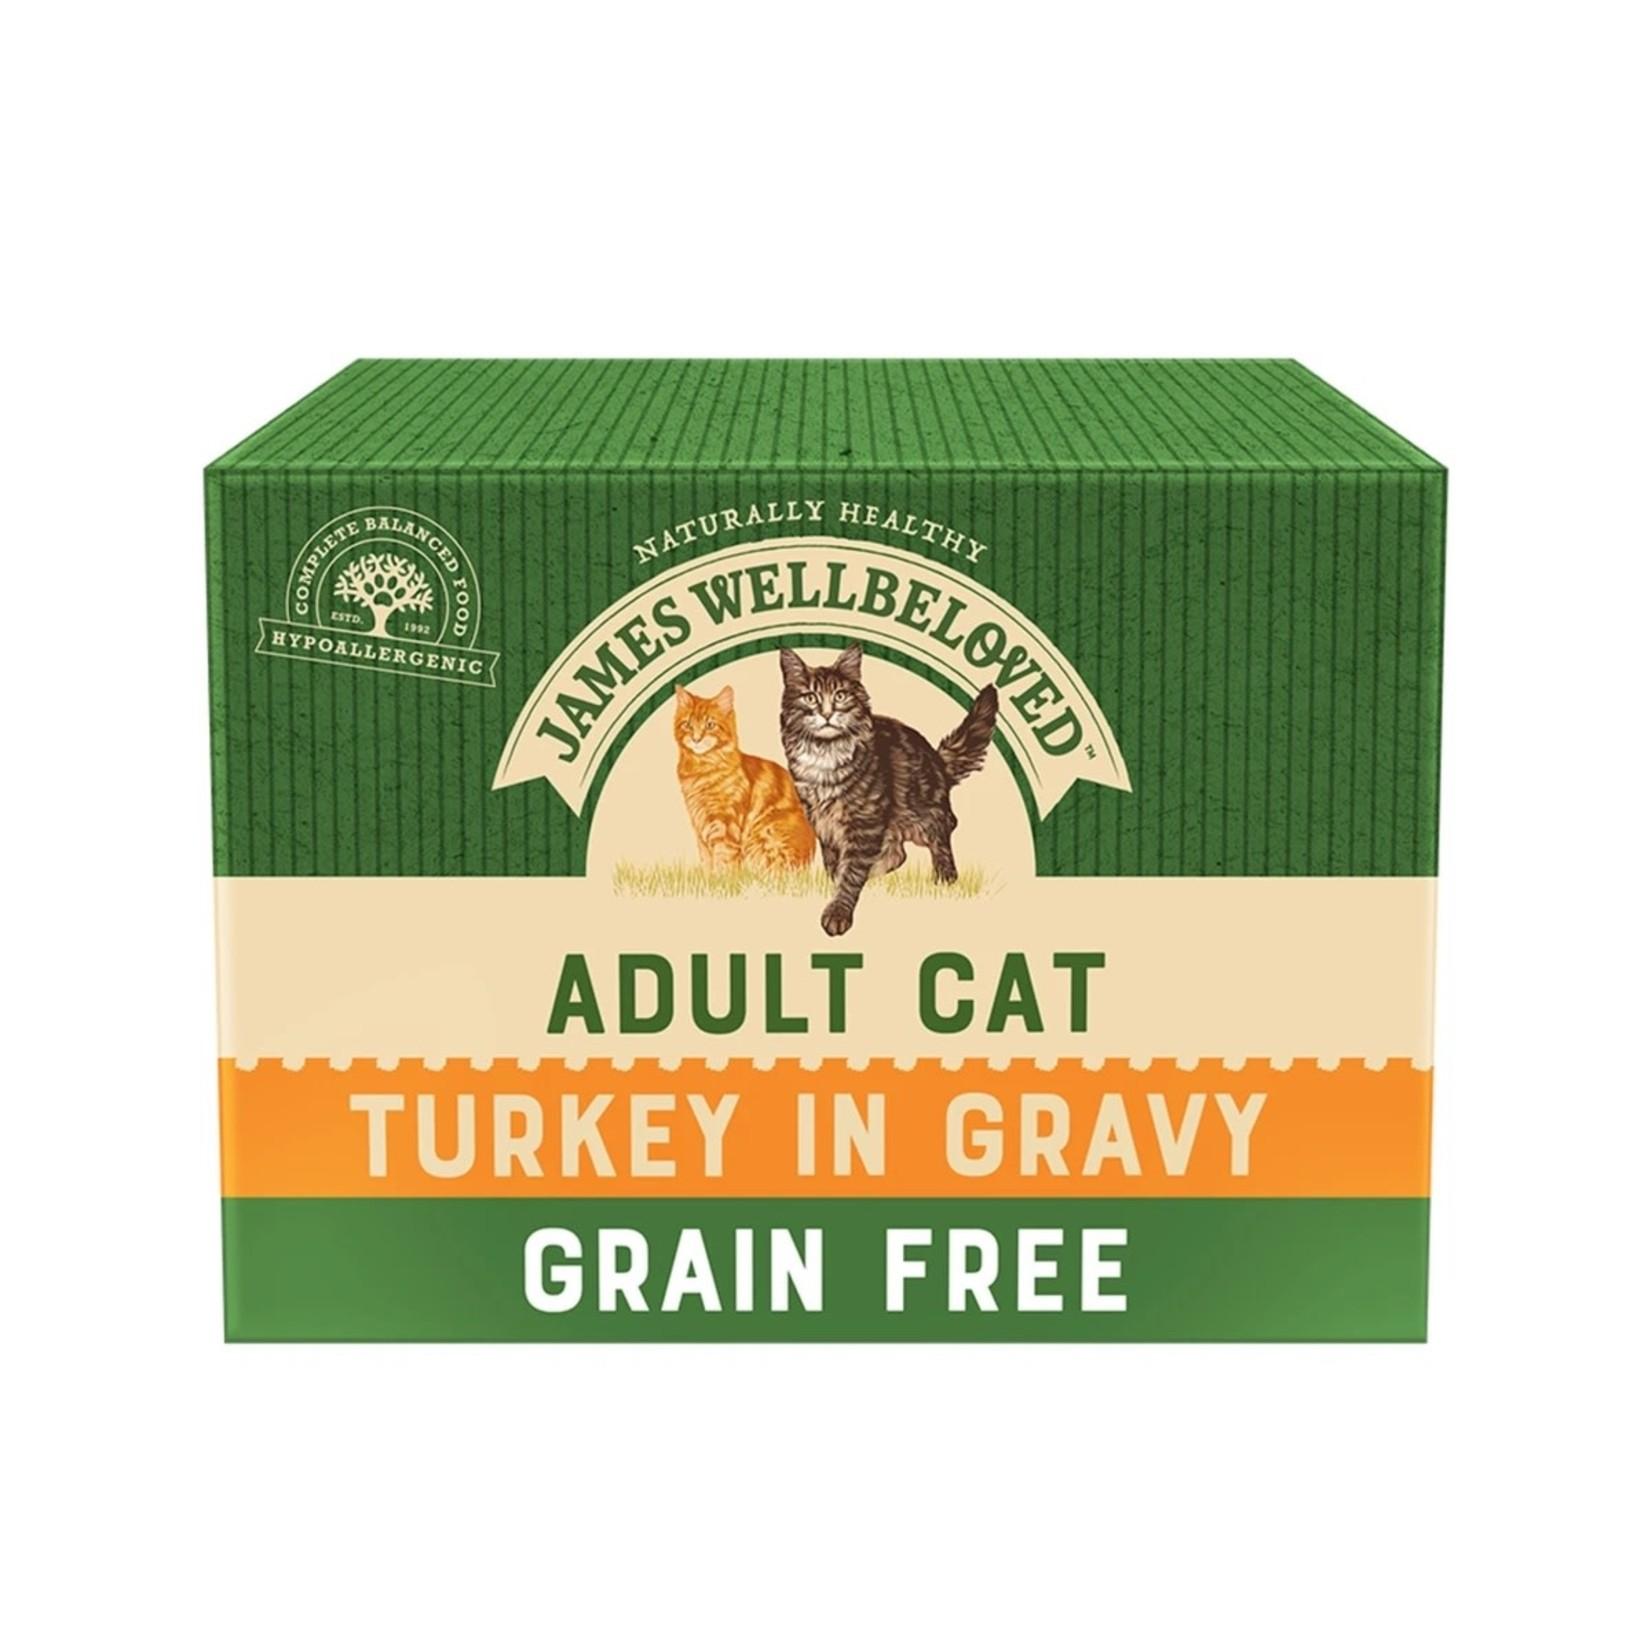 James Wellbeloved Grain Free Adult Cat Wet Food Pouch Turkey, 85g, Box of 12